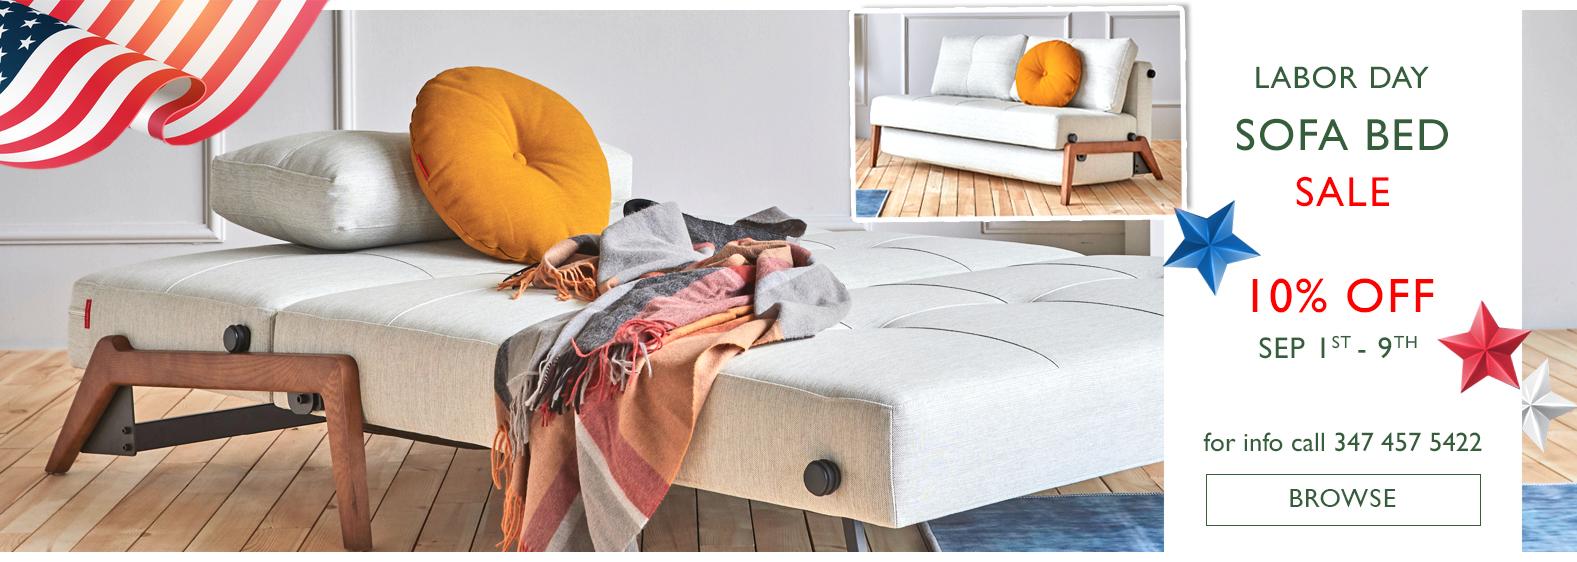 Scott Jordan Labor Day 2020 Innovation Sofa Bed Sale